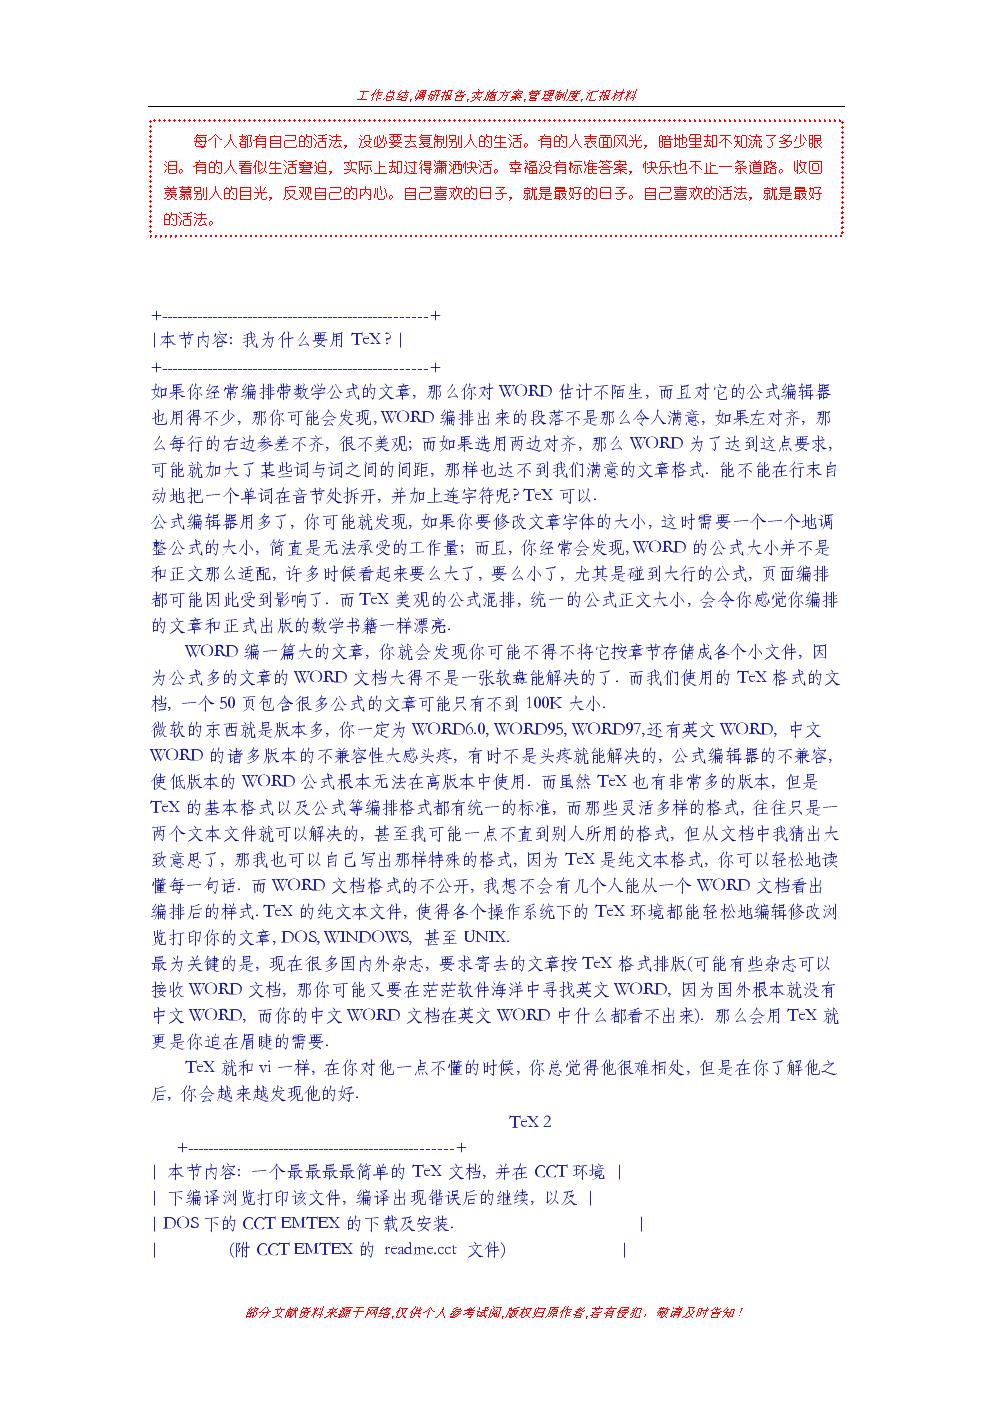 tex软件学习教程.docx